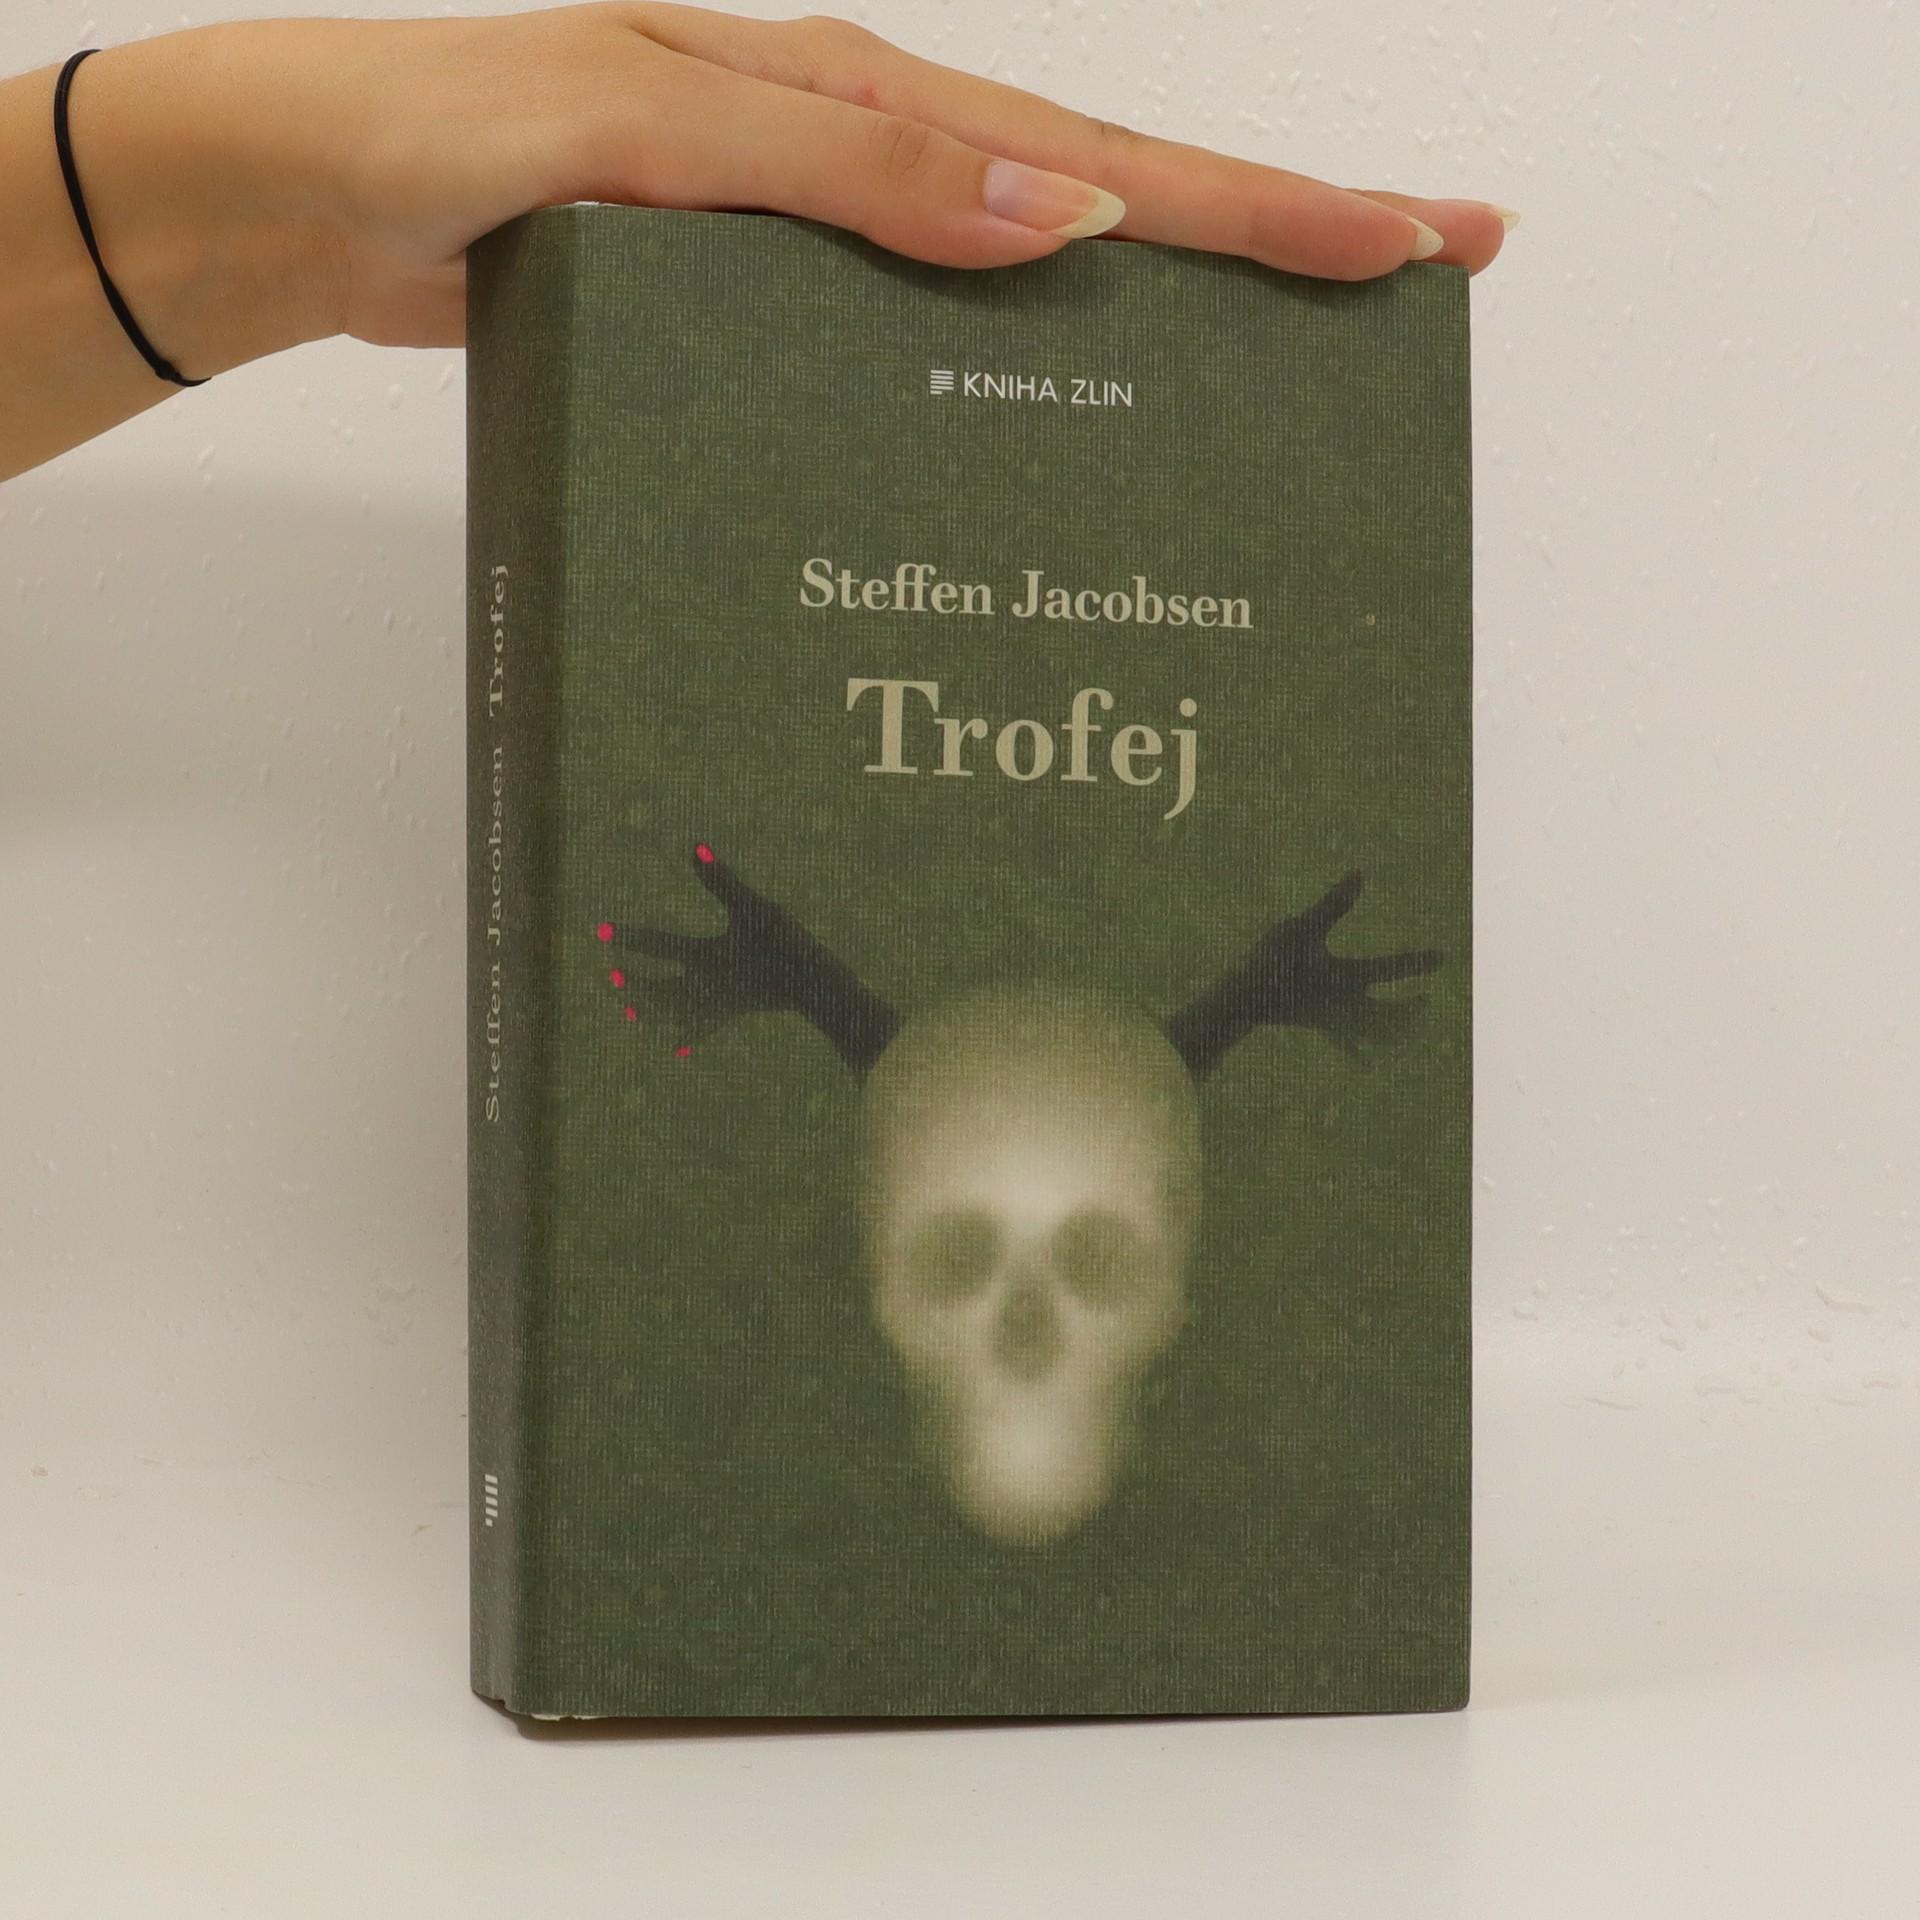 antikvární kniha Trofej, 2015